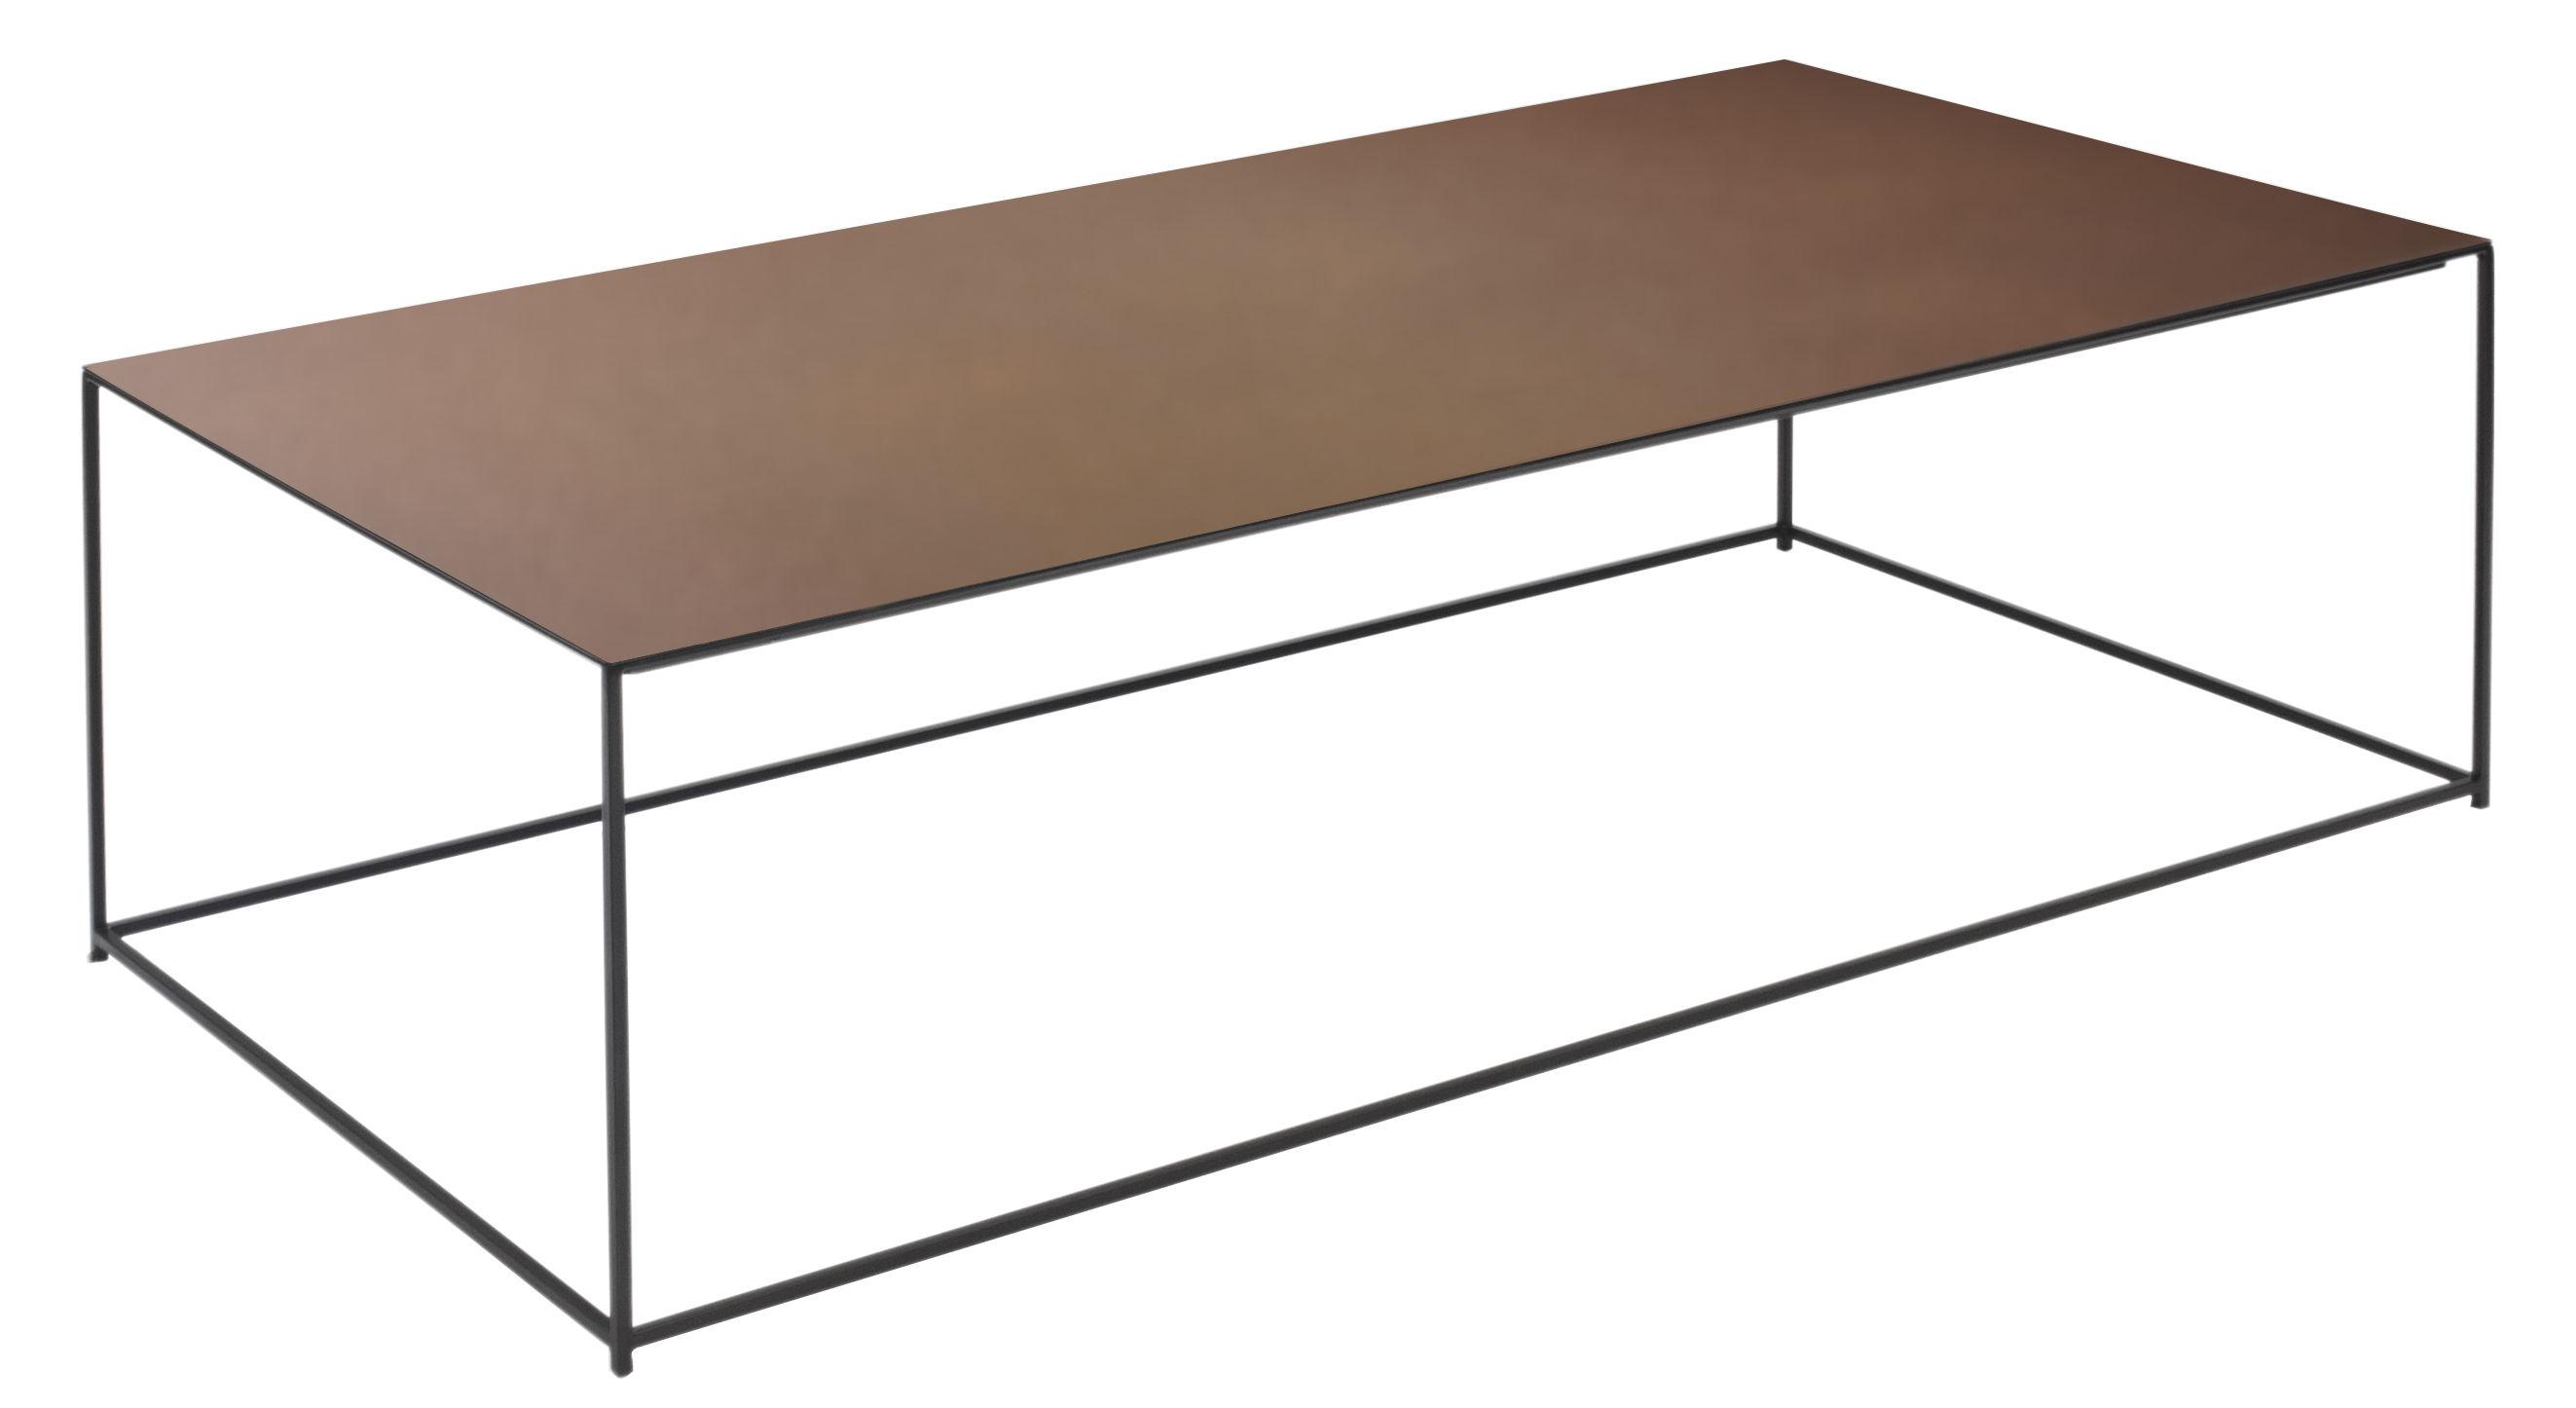 Arredamento - Tavolini  - Tavolino basso Slim Irony / 124 x 62 x H 34 cm - Zeus - Metallo ruggine / Piede nero ramato - Acciaio verniciato